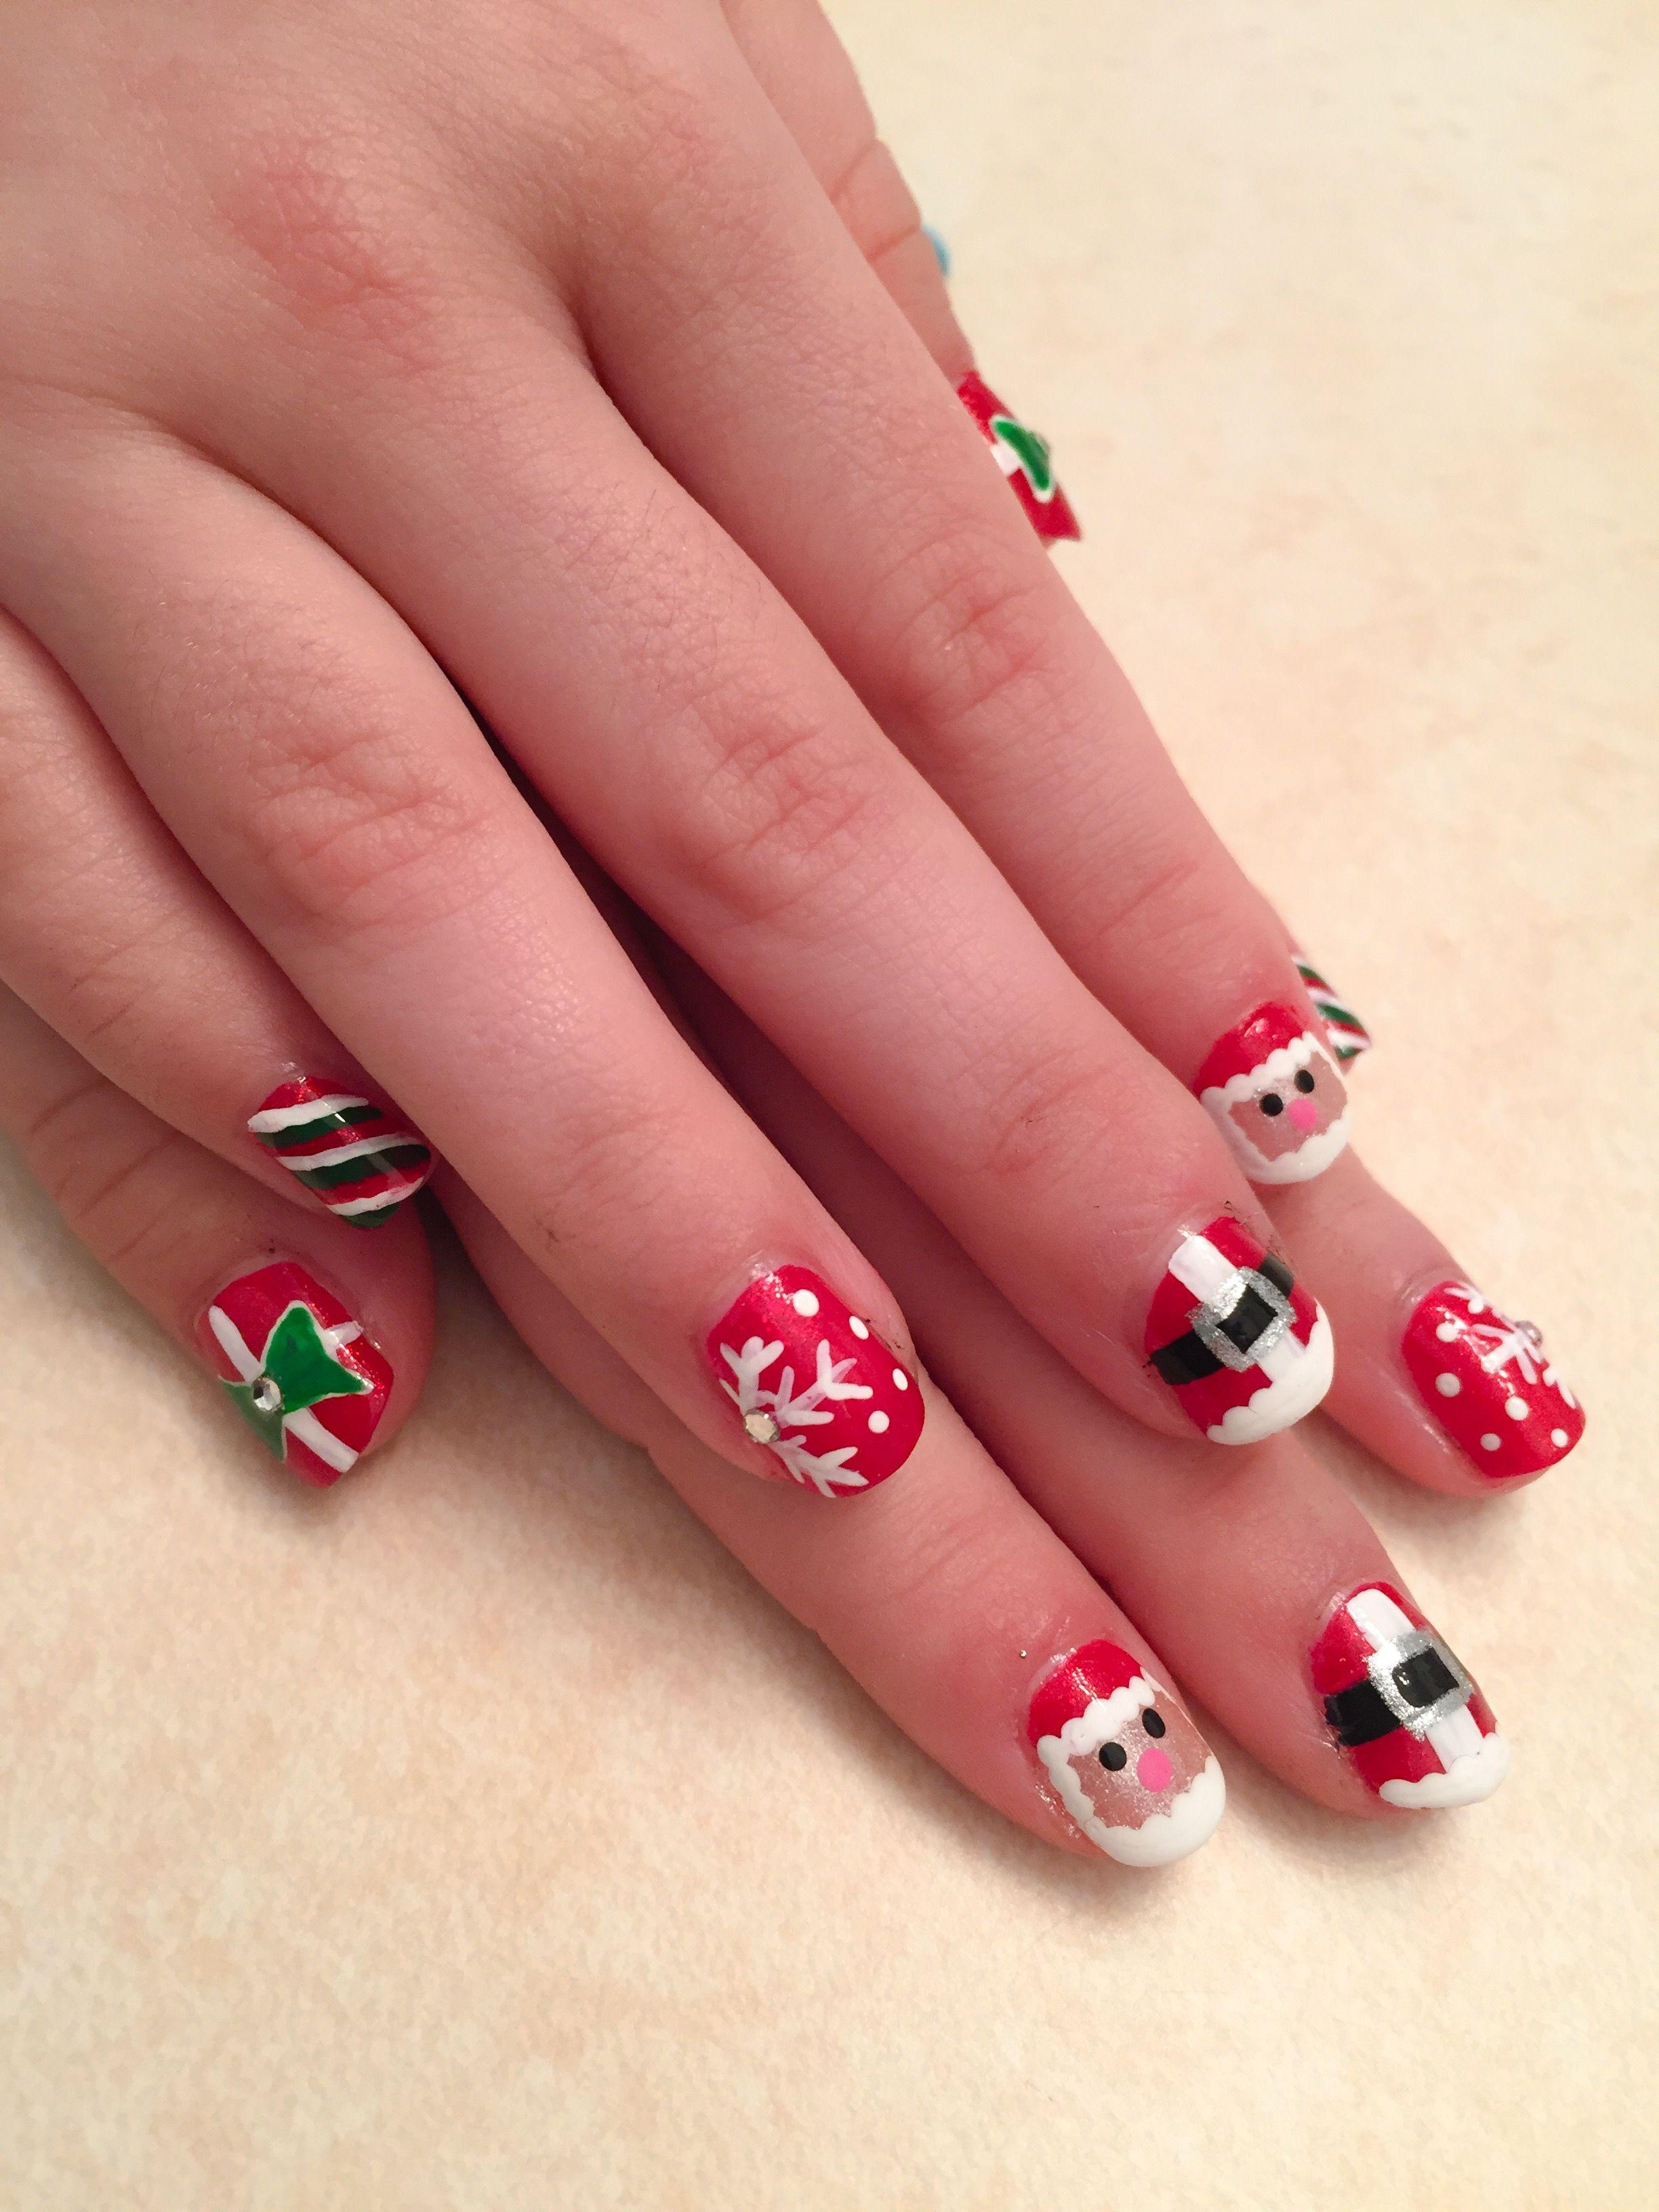 Christmas nails kids 2016 | Nails by me 4 u | Pinterest